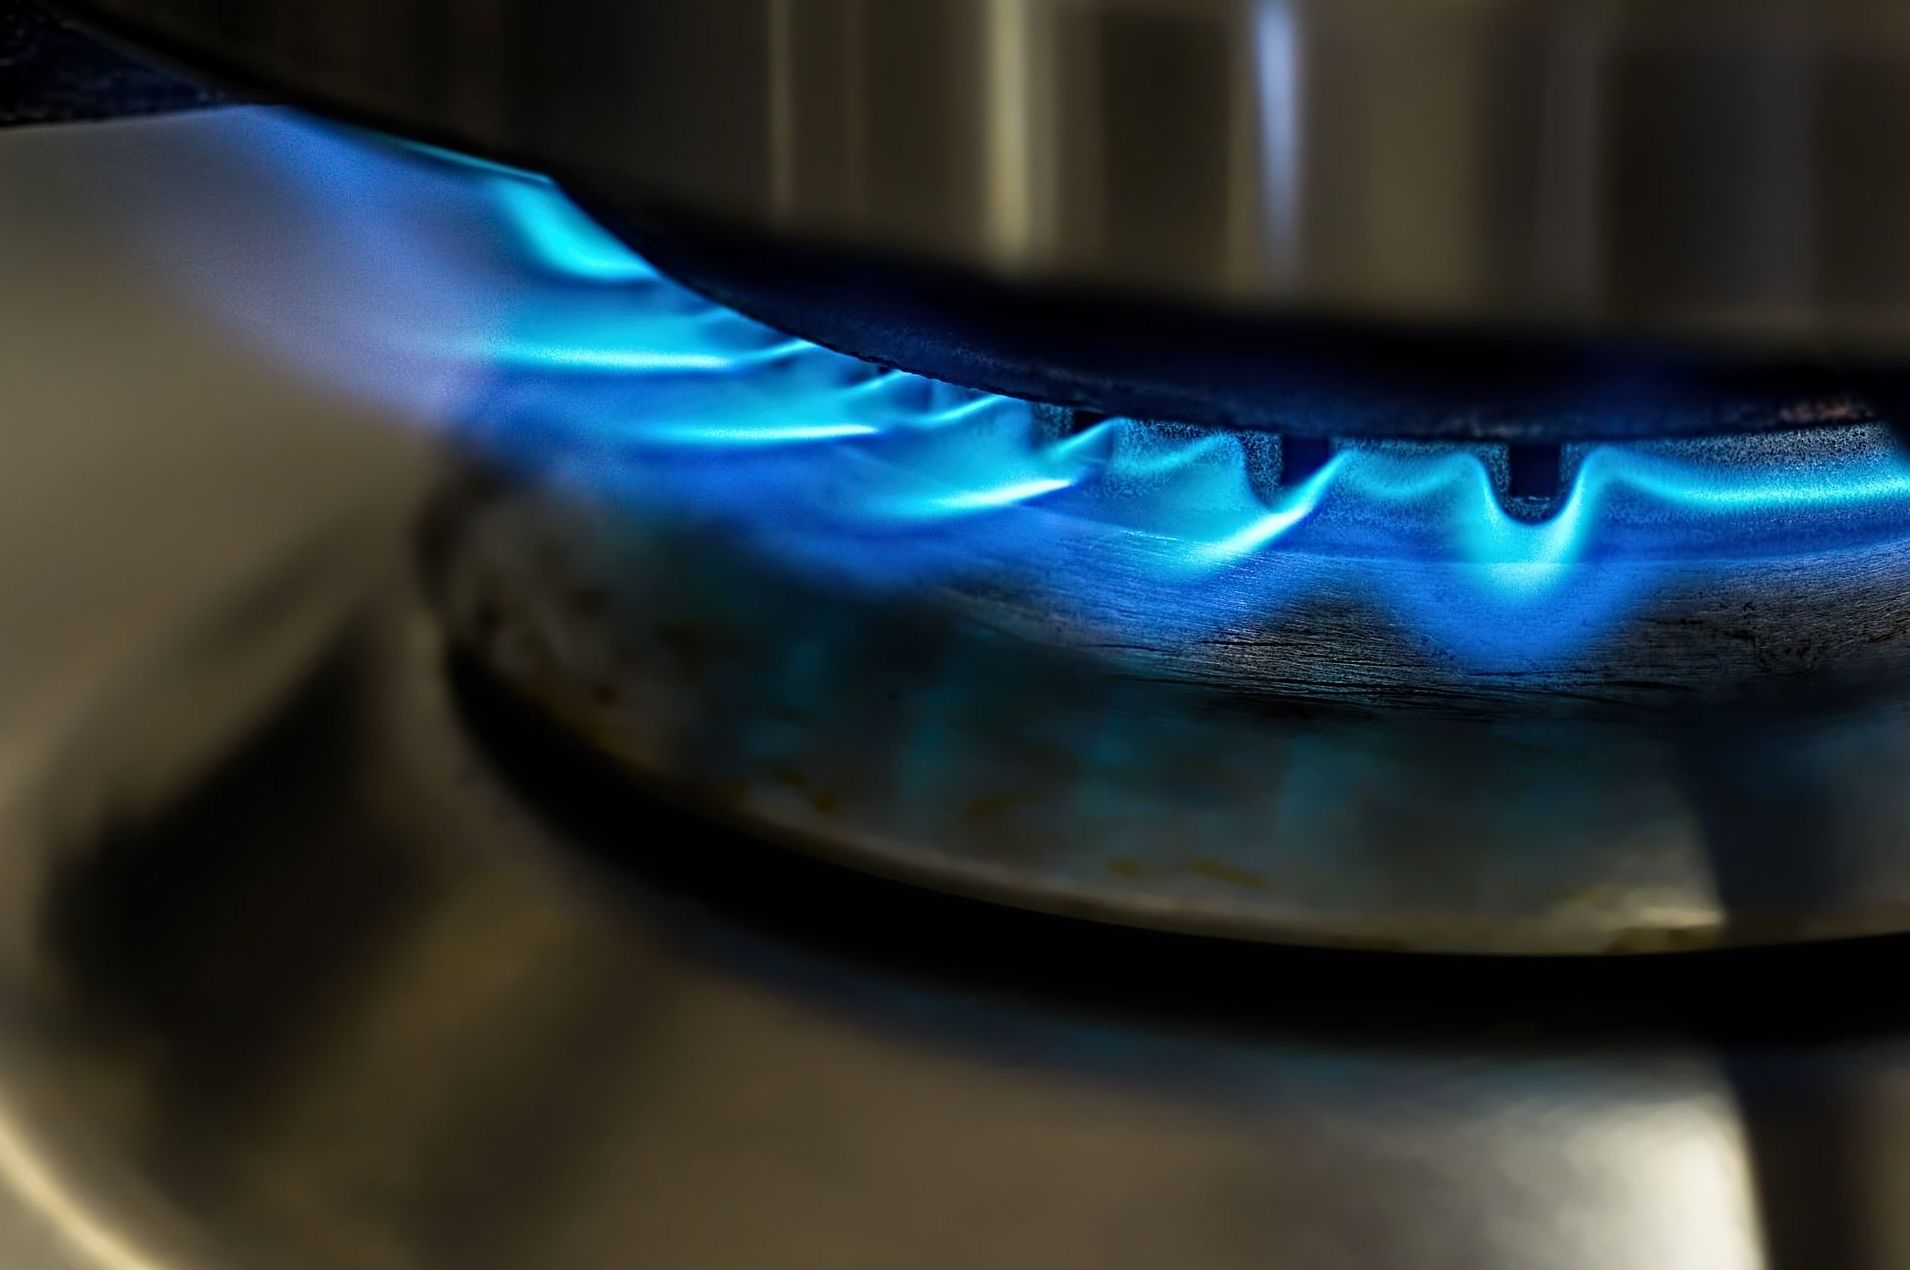 Colaborador de gas natural en Castellón de la Plana